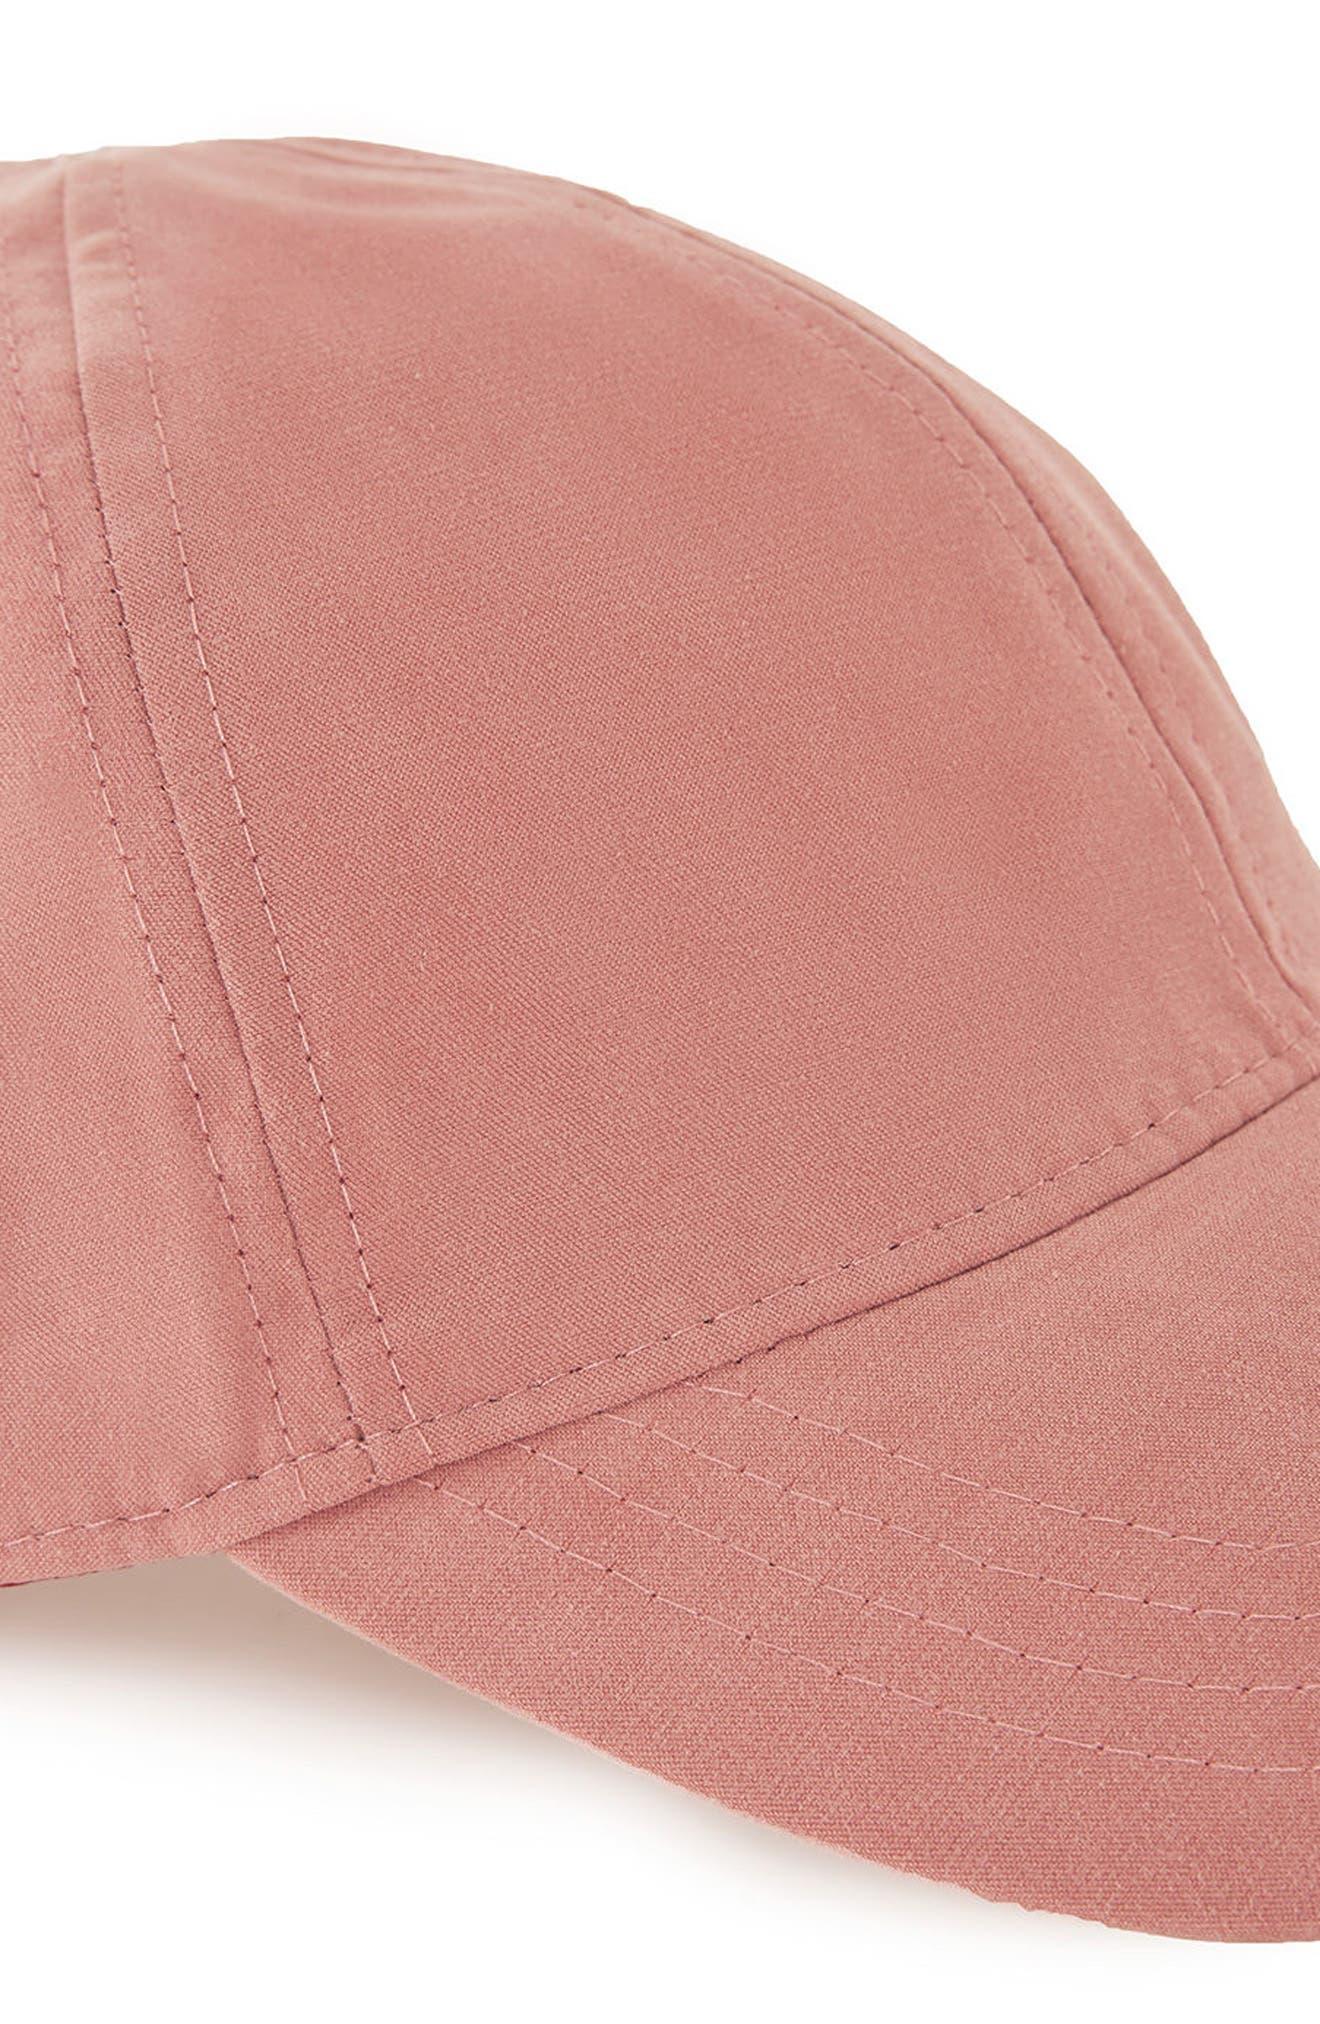 Brushed Ball Cap,                             Alternate thumbnail 3, color,                             Pink